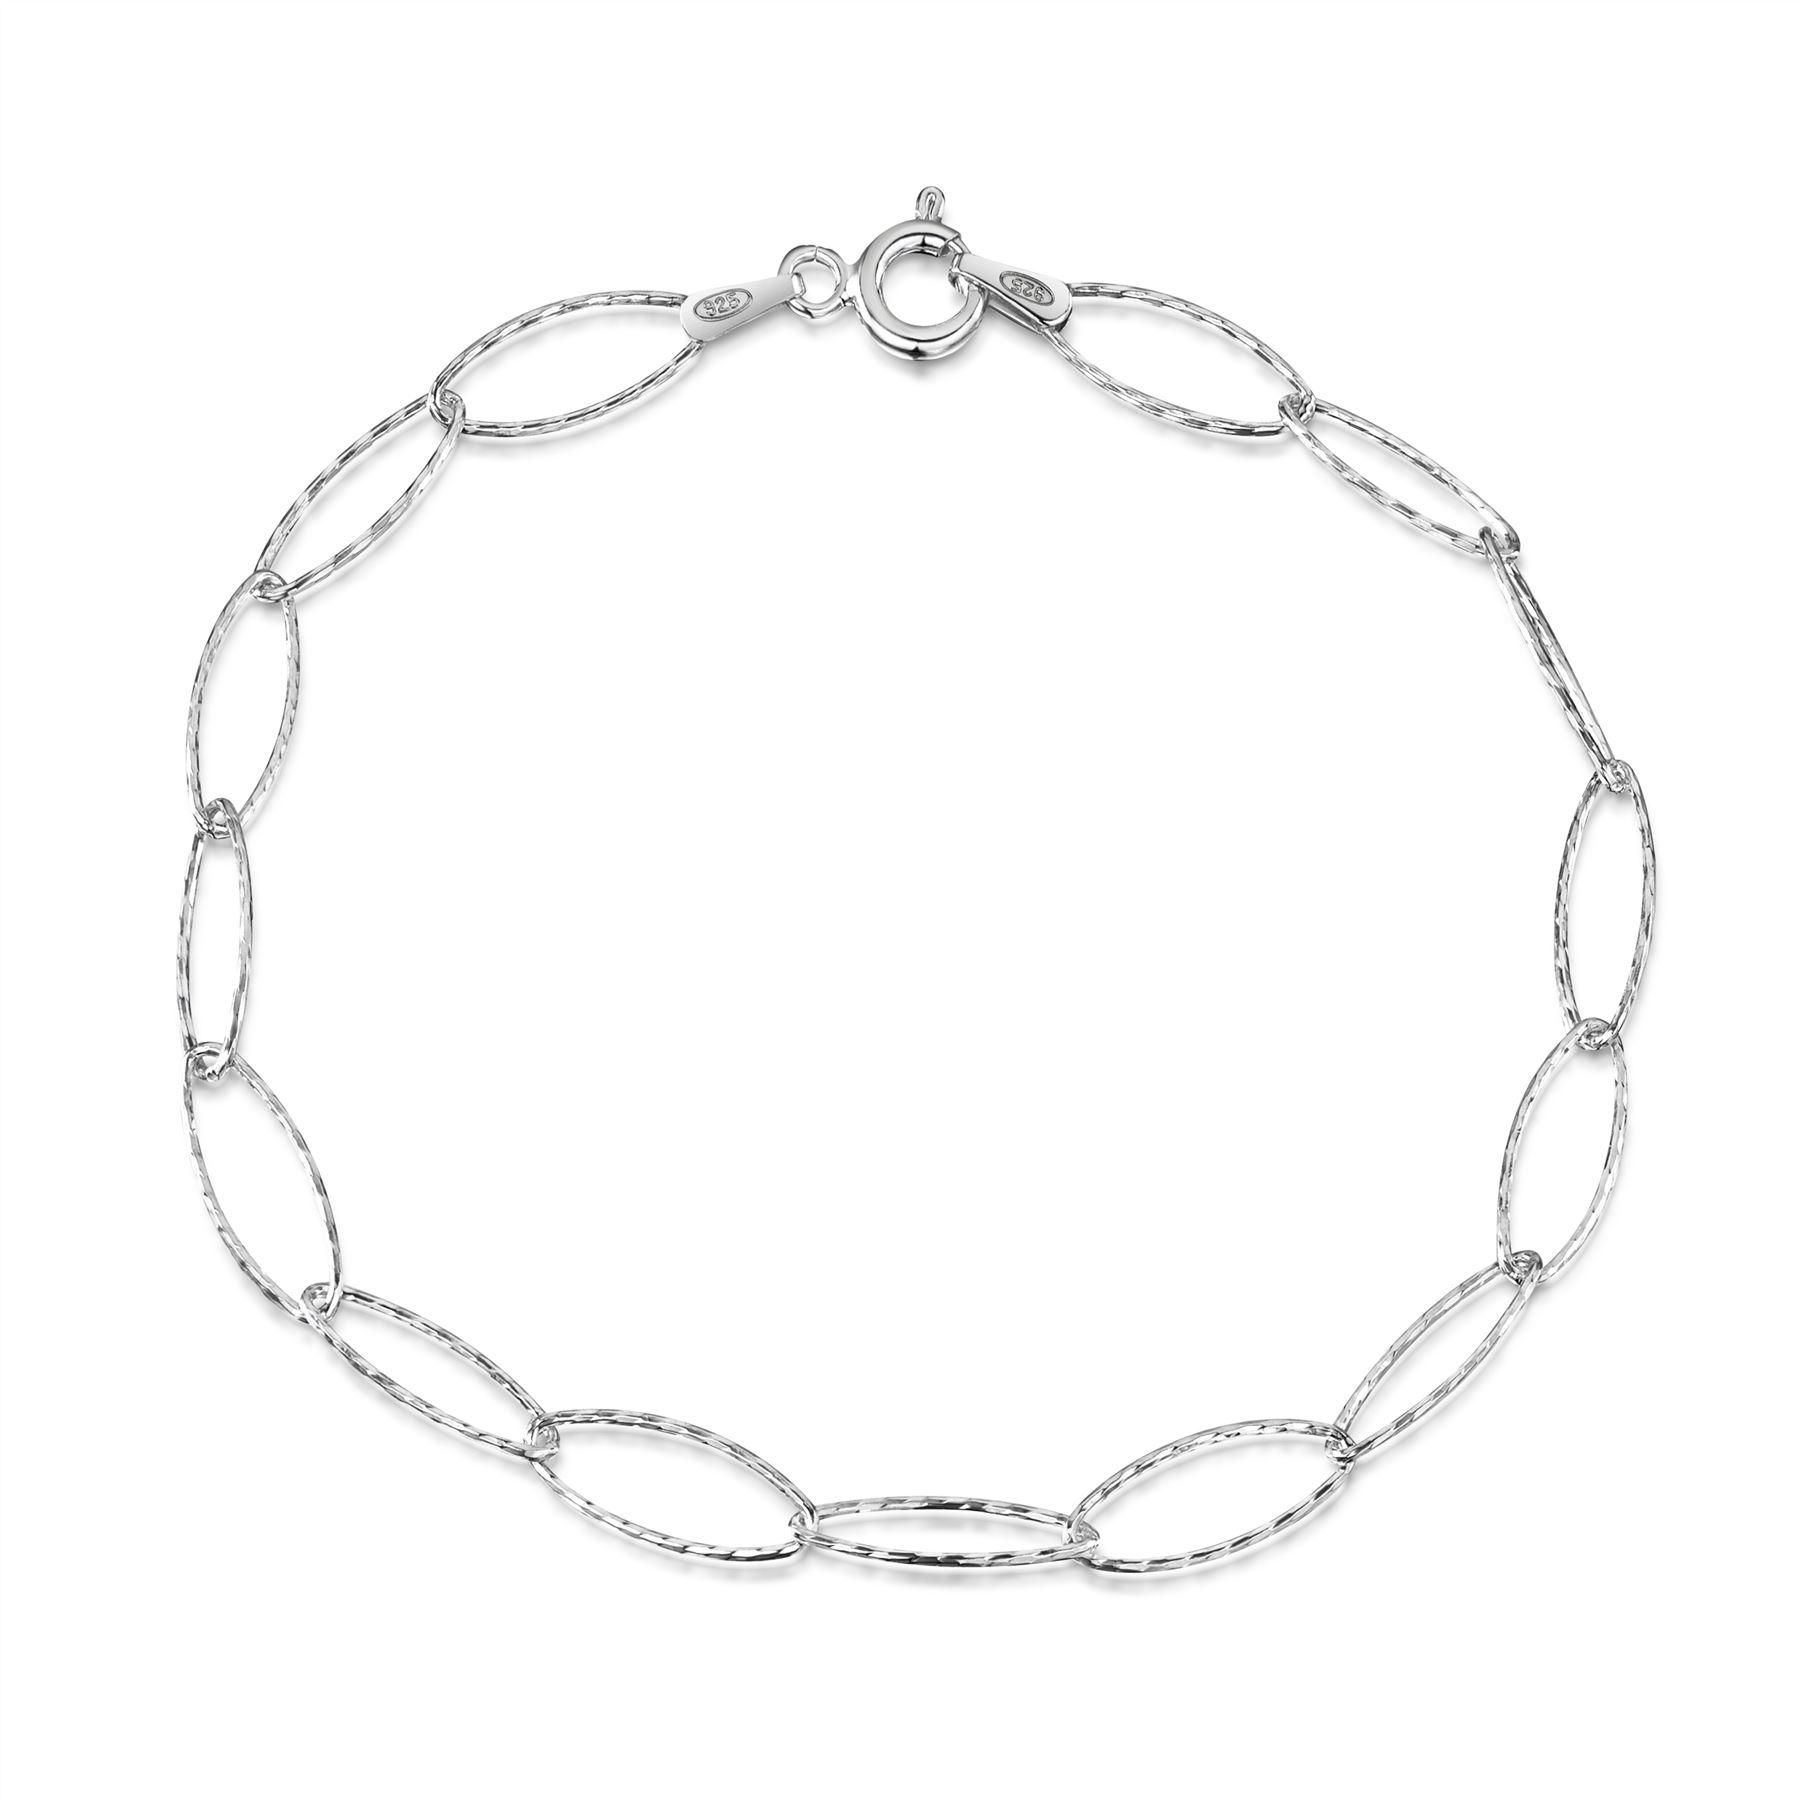 Amberta-Pulsera-en-Autentica-Plata-De-Ley-925-Brazalete-Precioso-para-Mujer miniatura 108